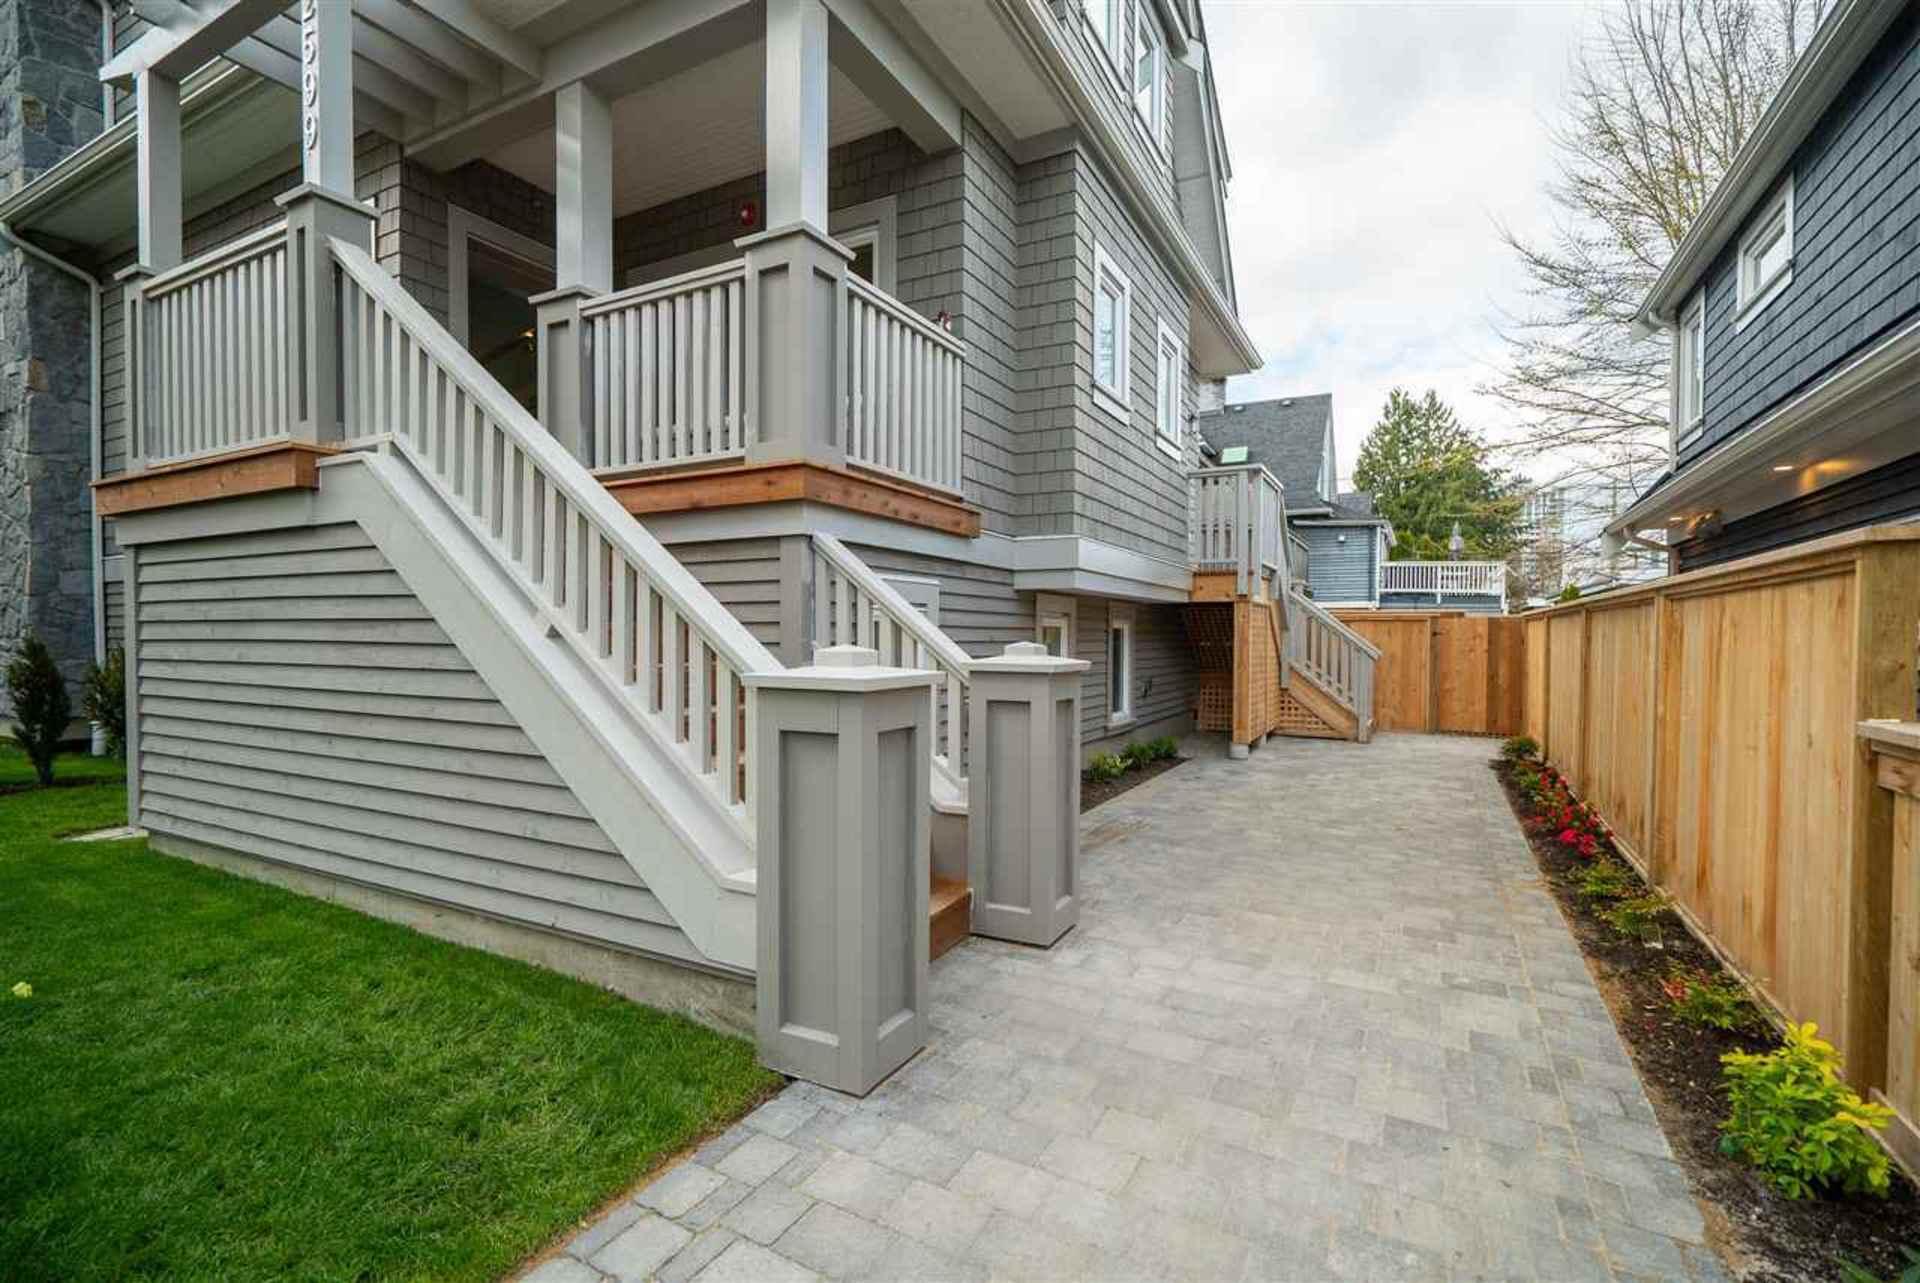 2599-stgeorge-street-mount-pleasant-ve-vancouver-east-04 at 2599 St.george Street, Mount Pleasant VE, Vancouver East